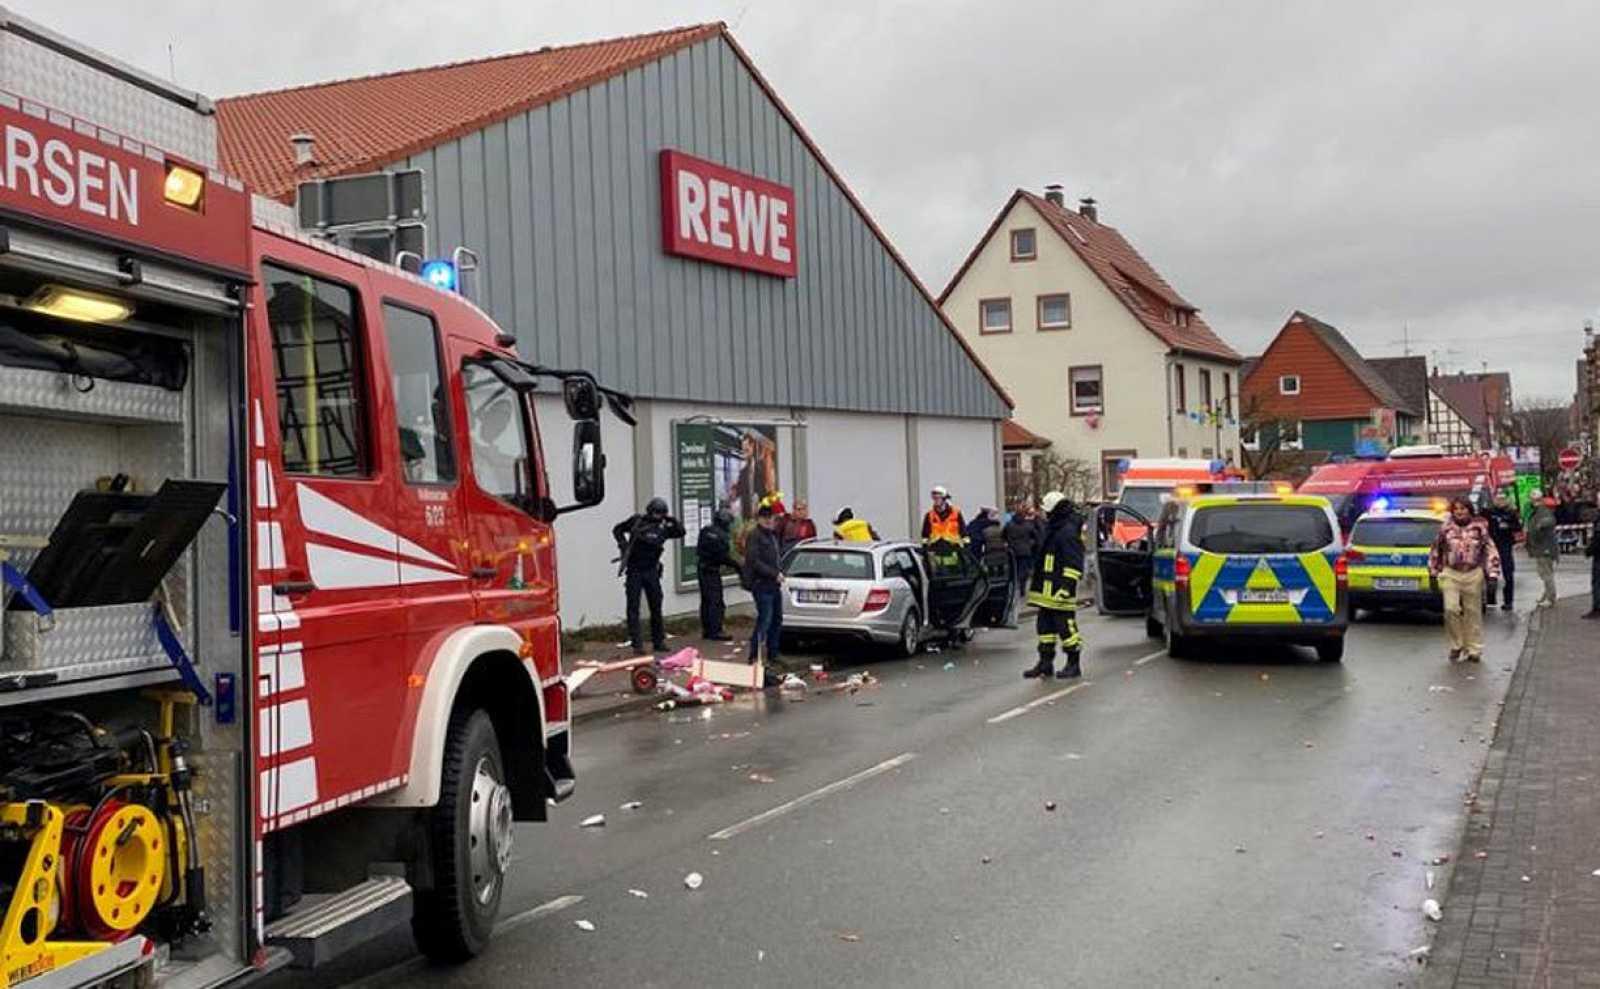 Atropello masivo a una multitud durante un desfile del carnaval en Volkmarsen, Alemani ile ilgili görsel sonucu